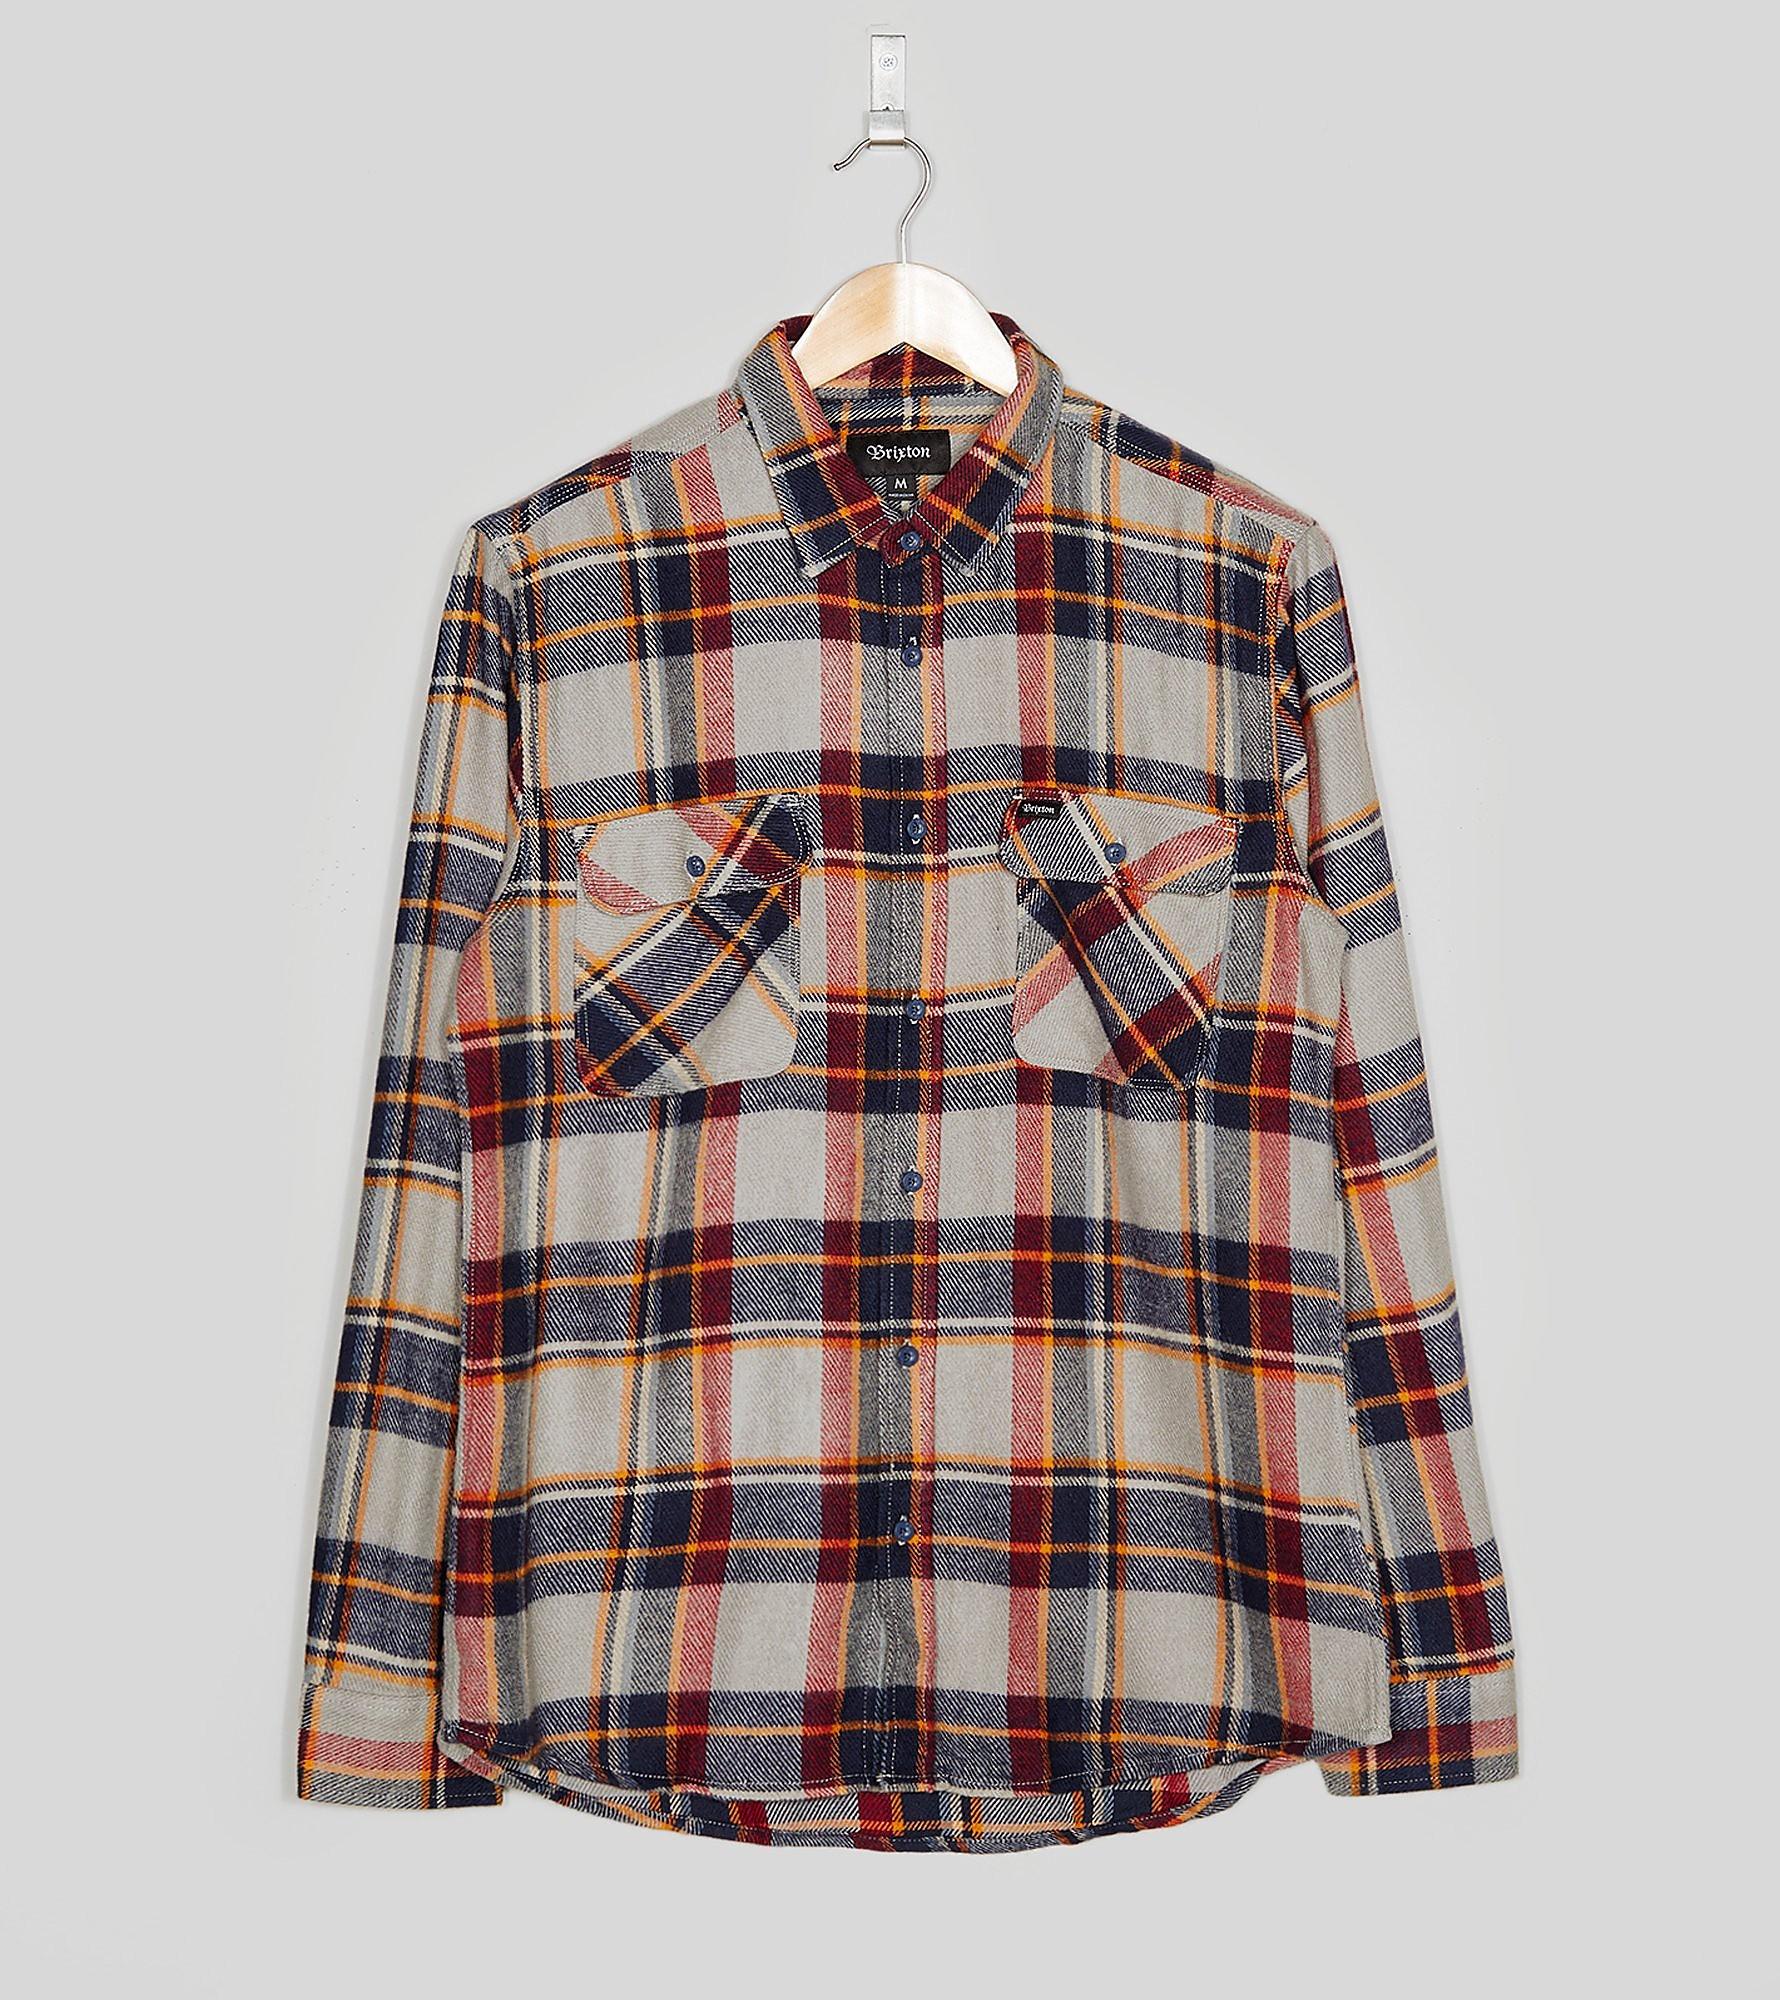 Brixton Long Sleeved Bowery Checked Shirt, Blue/Red/Orange